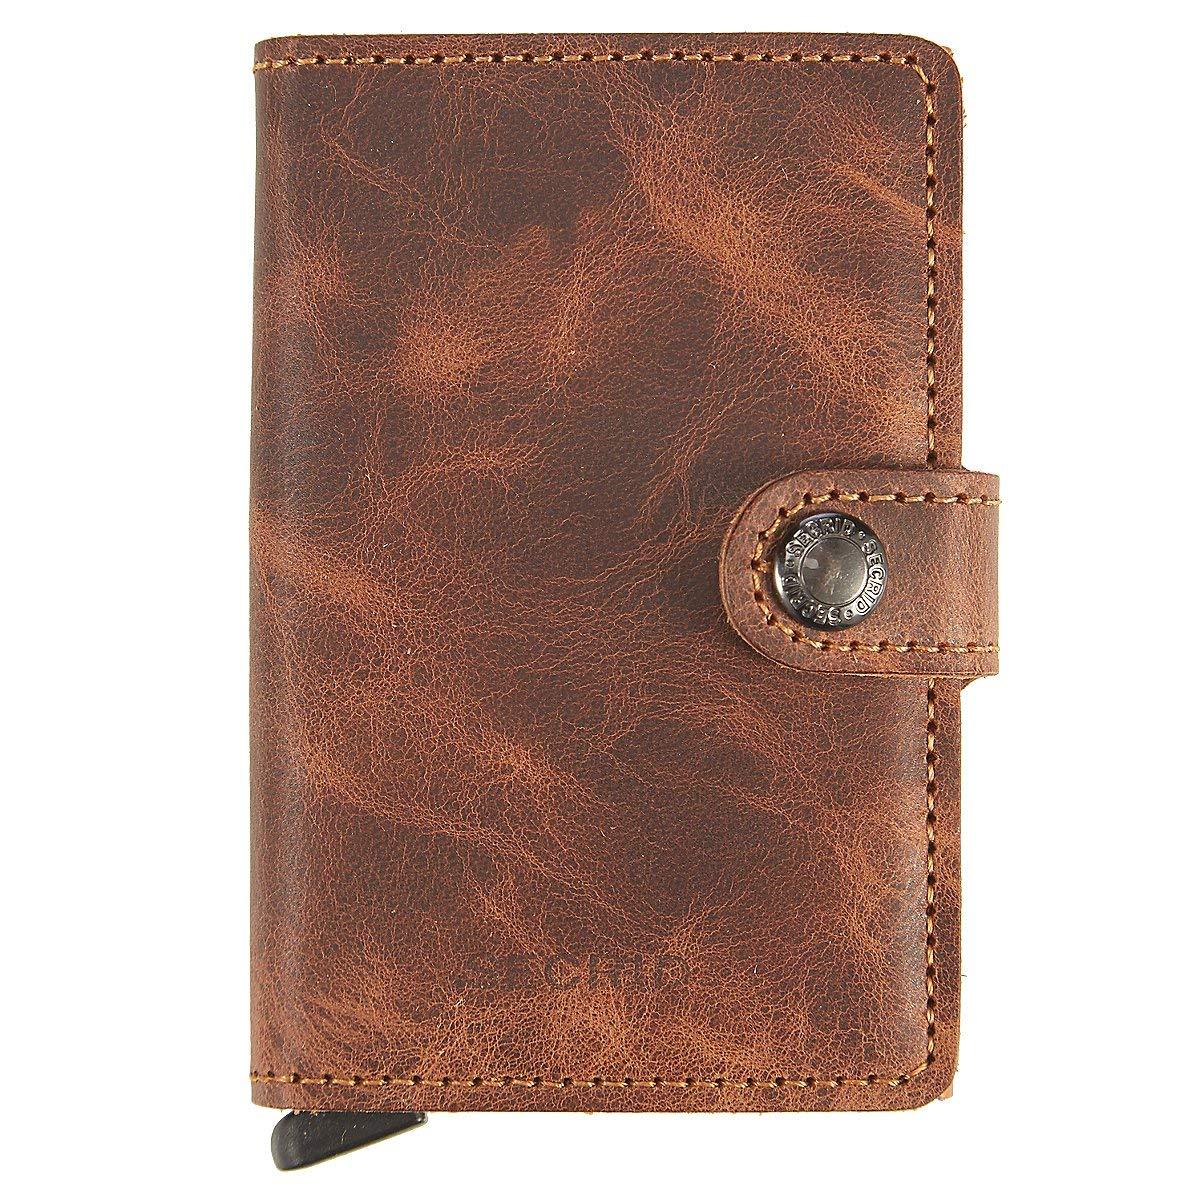 SECRID - Secrid Mini wallet Genuine Leather Cognac RFID Safe Card Case for max 12 cards (Cognac)